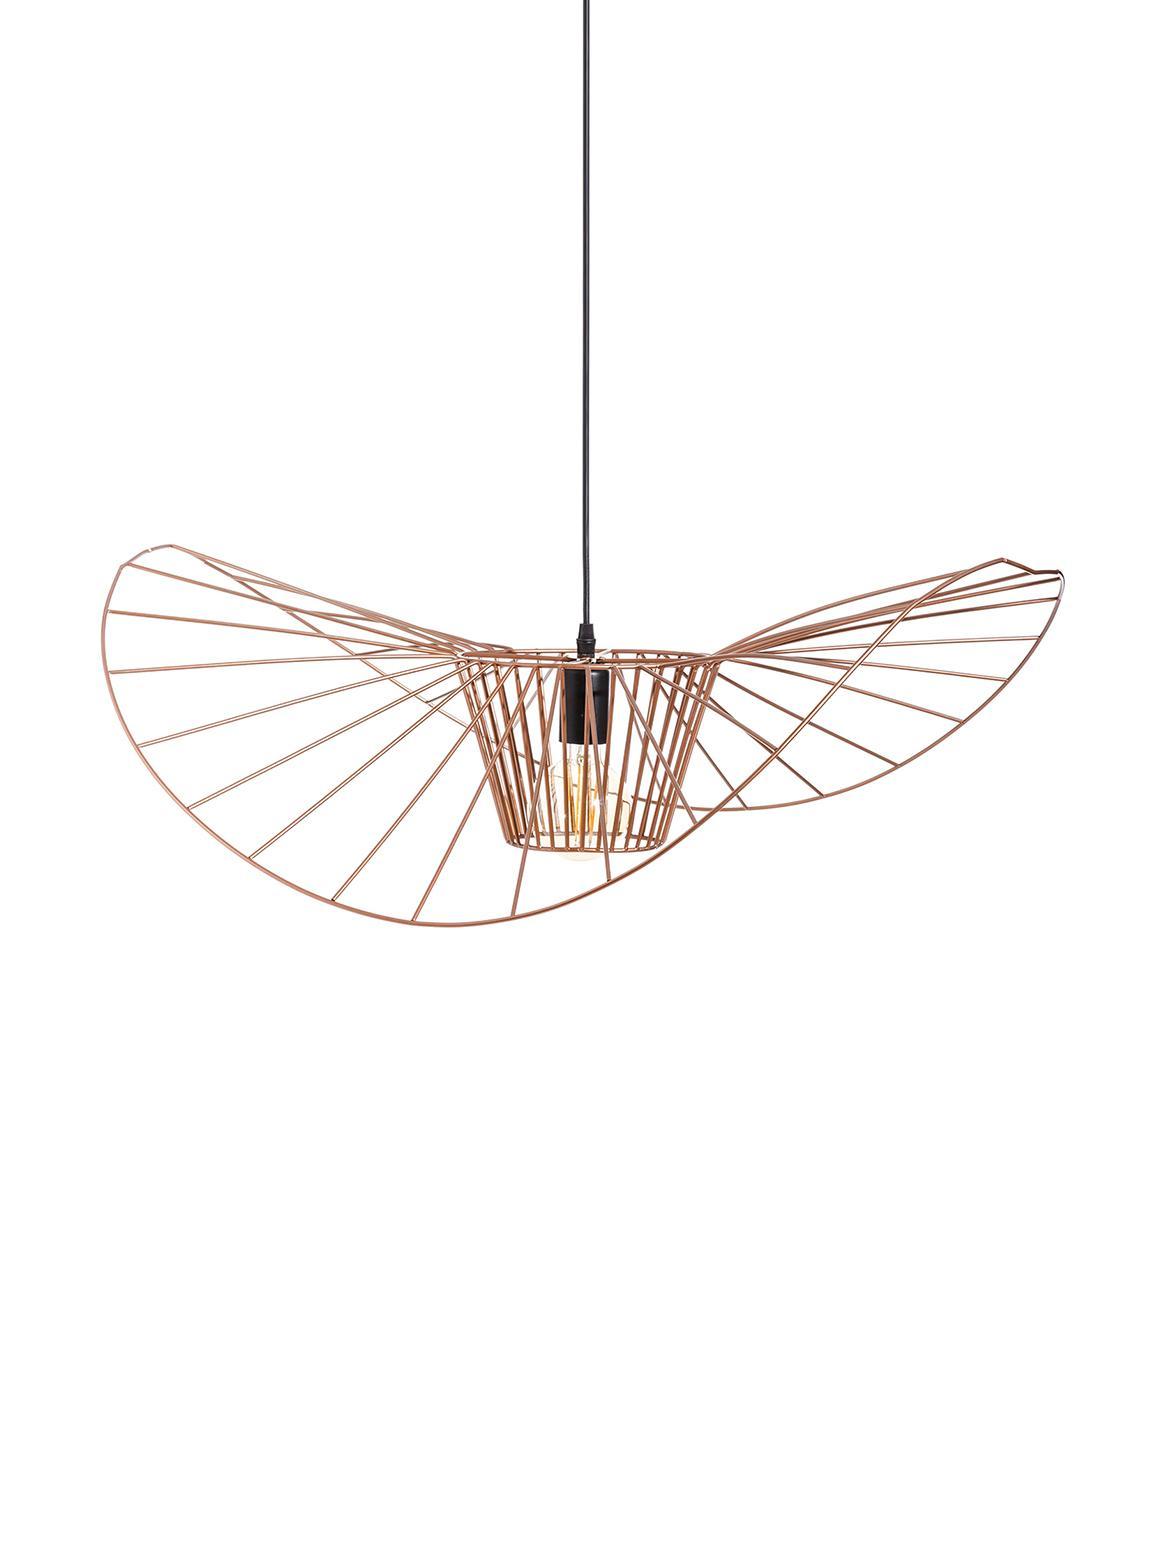 Grote hanglamp Stingray, Gecoat metaal, Messingkleurig, Ø 72 x D 72 cm